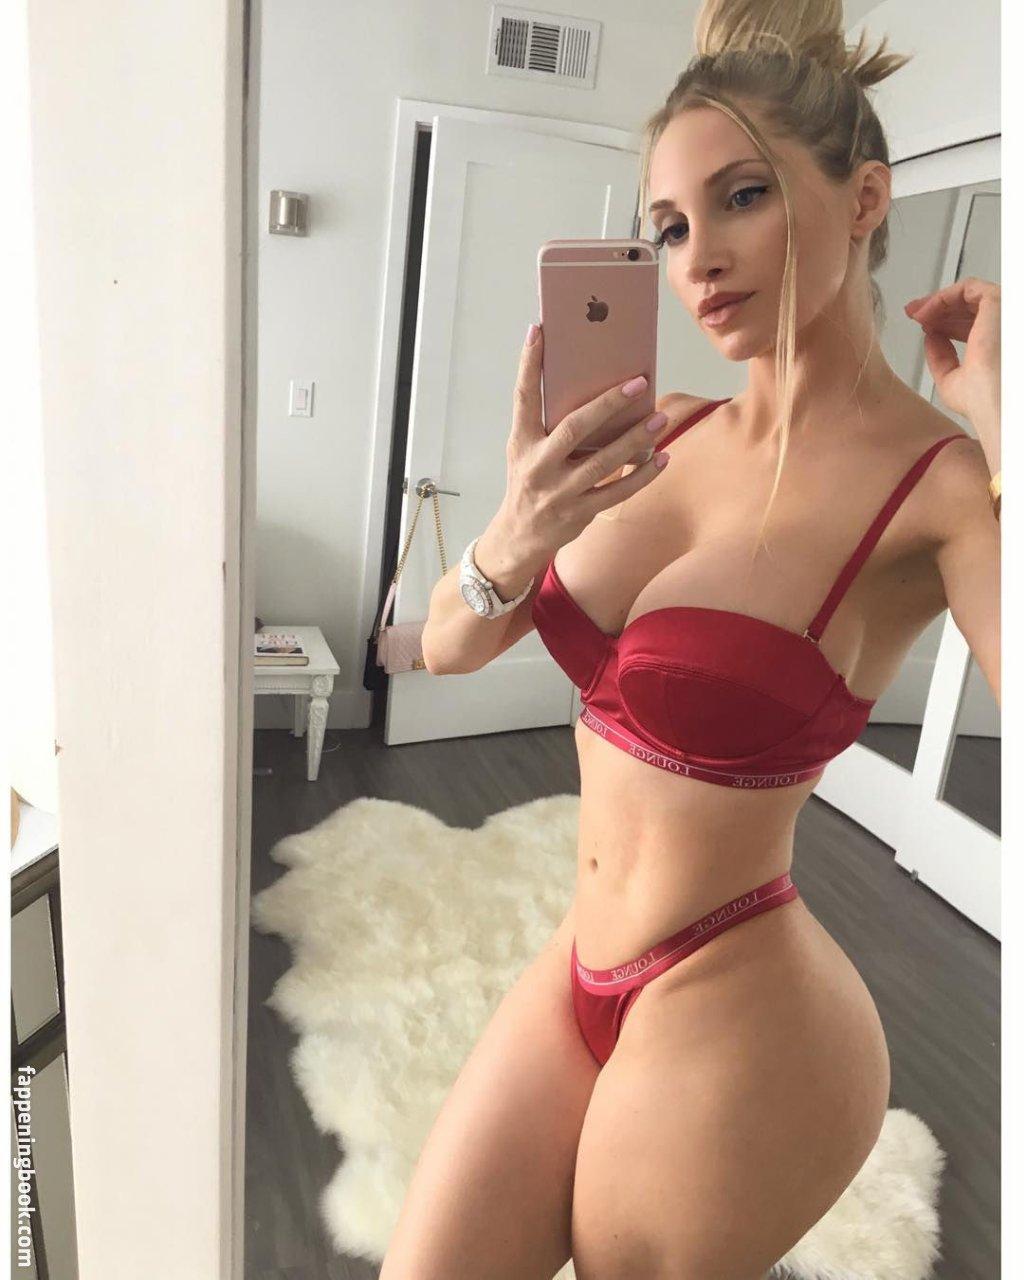 Amanda Jones Nude amanda lee nude, sexy, the fappening, uncensored - photo